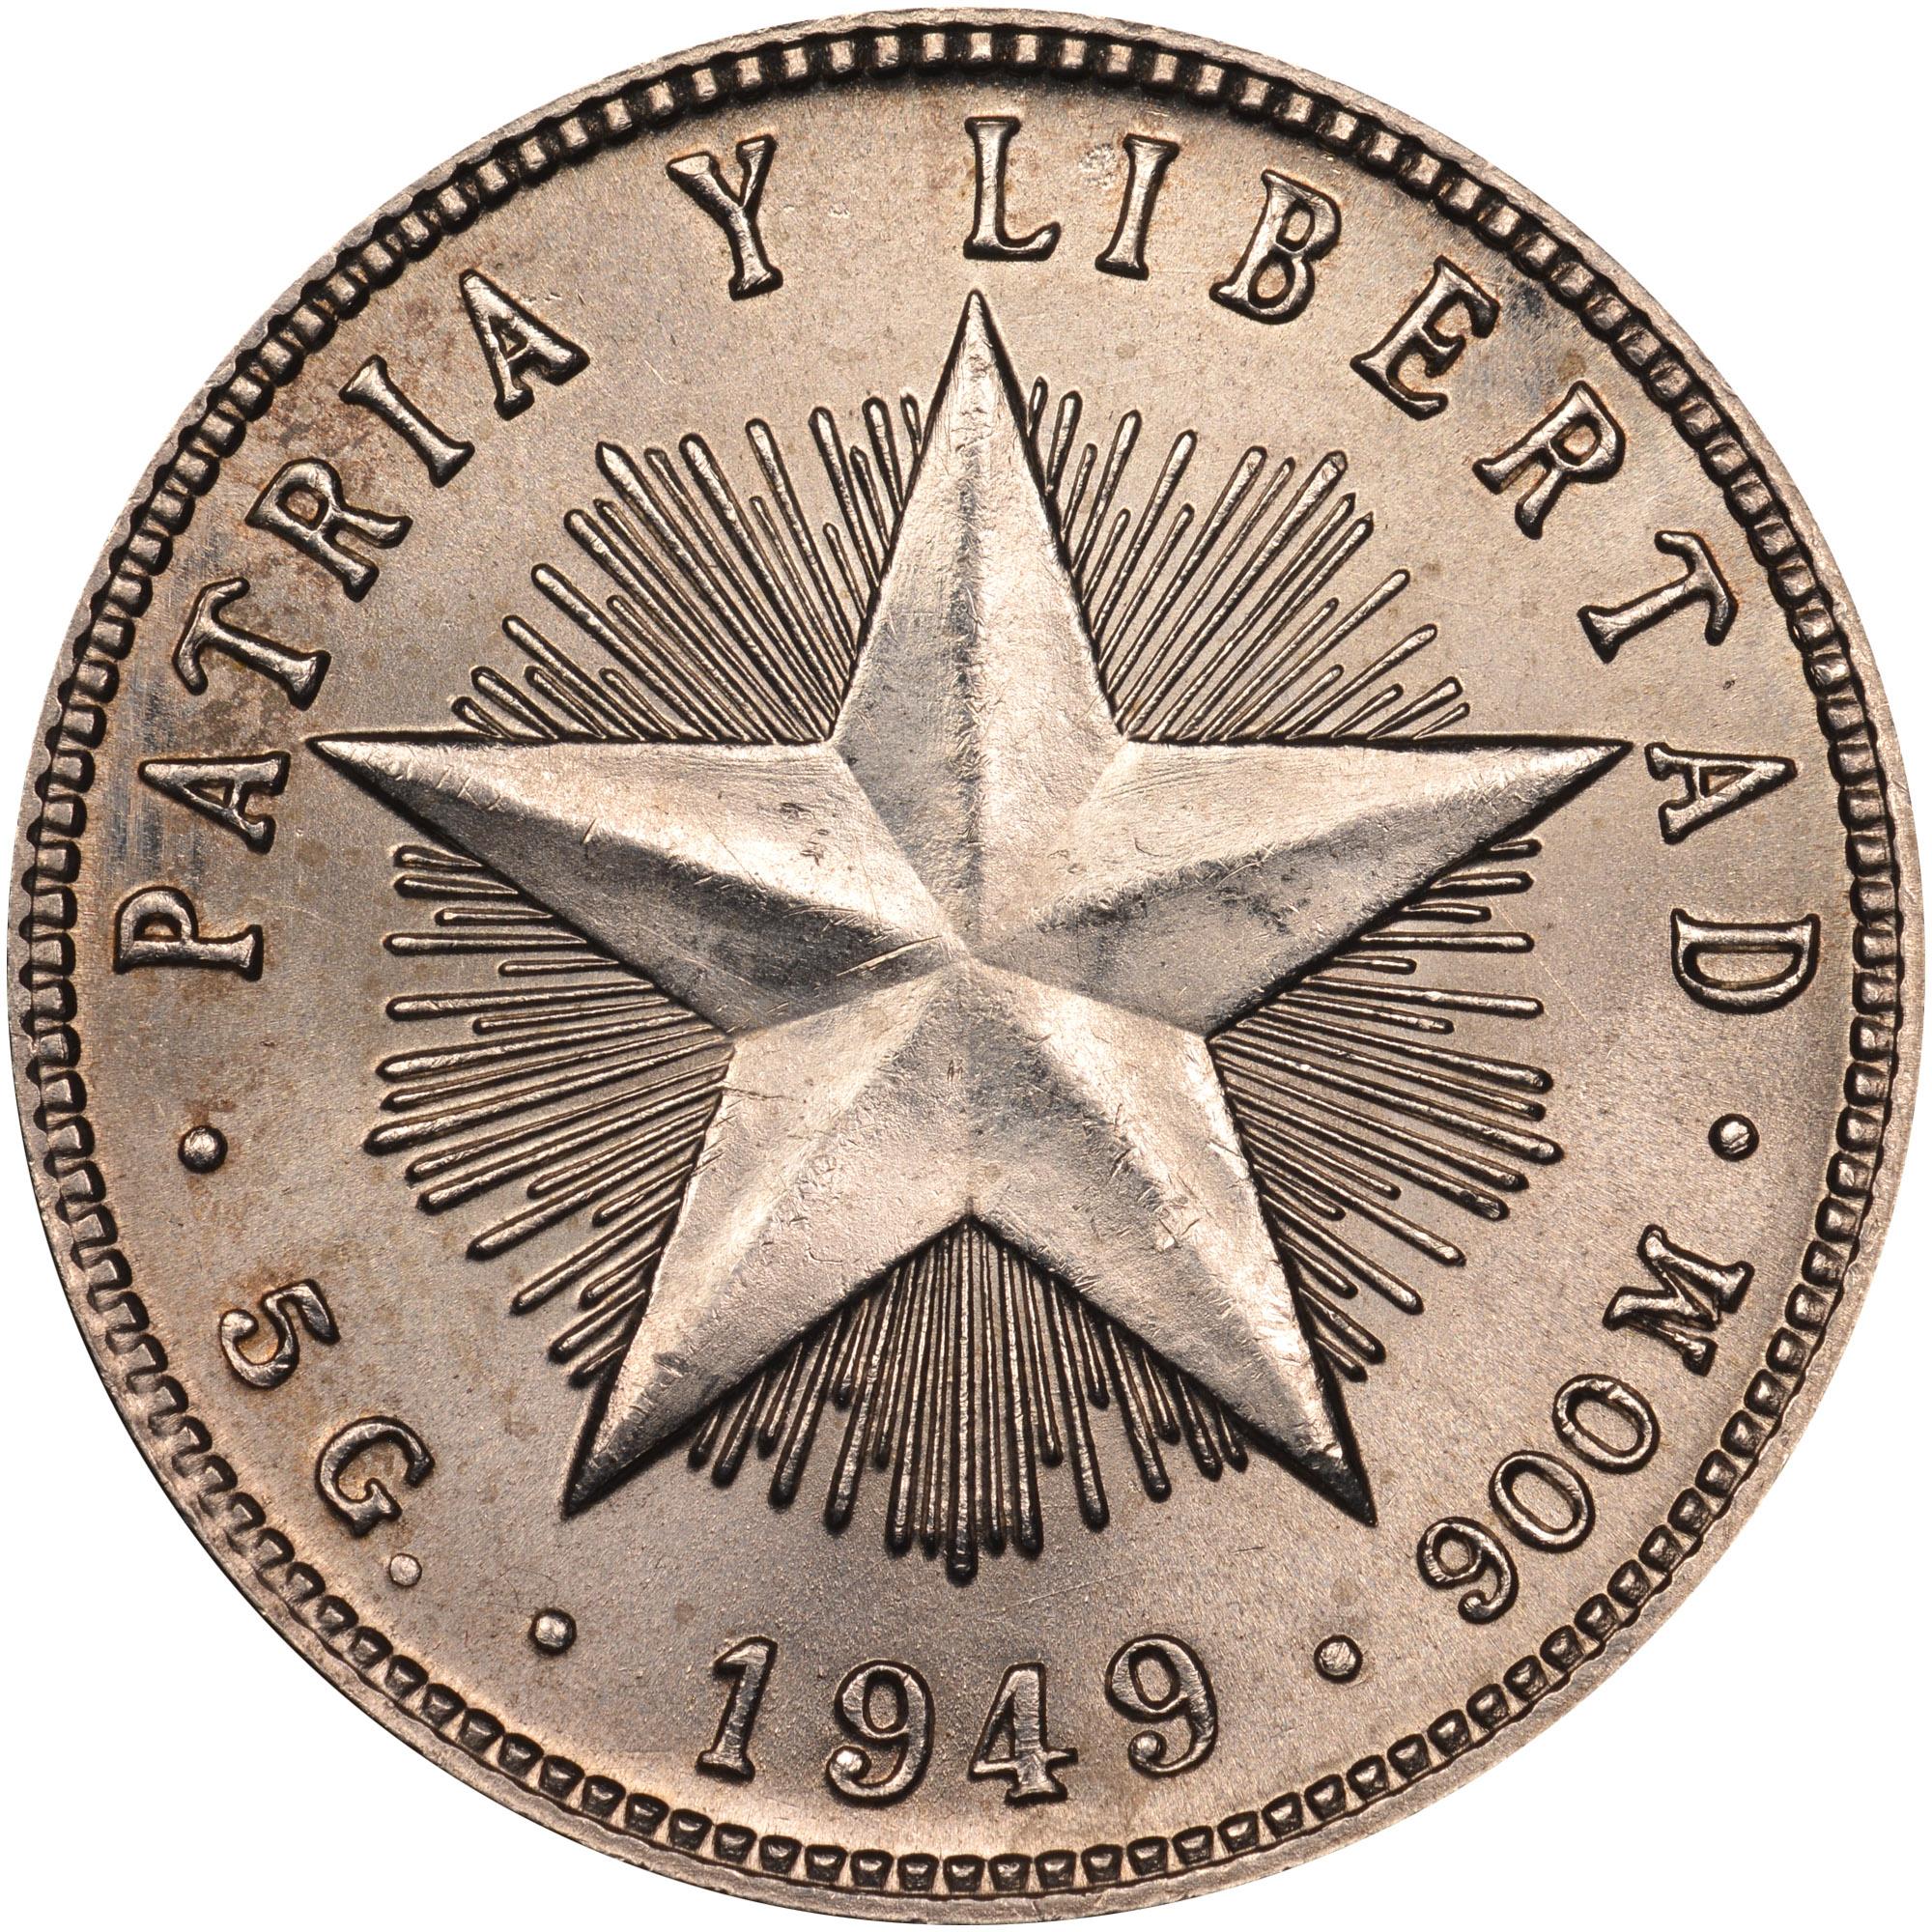 1915-1949 Cuba 20 Centavos reverse